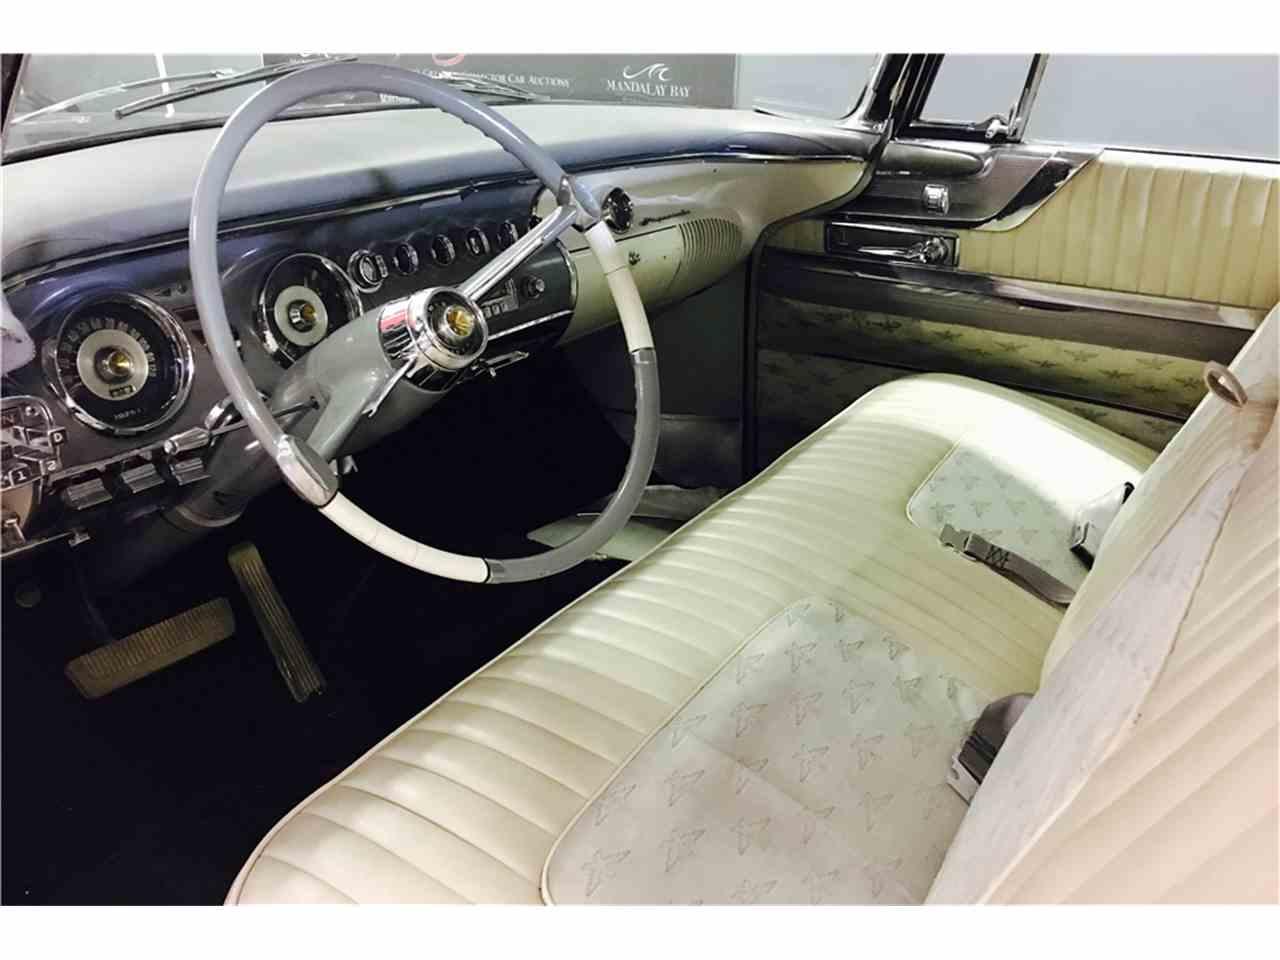 1956 chrysler imperial interior images - 1956 Chrysler Imperial Cc 992847